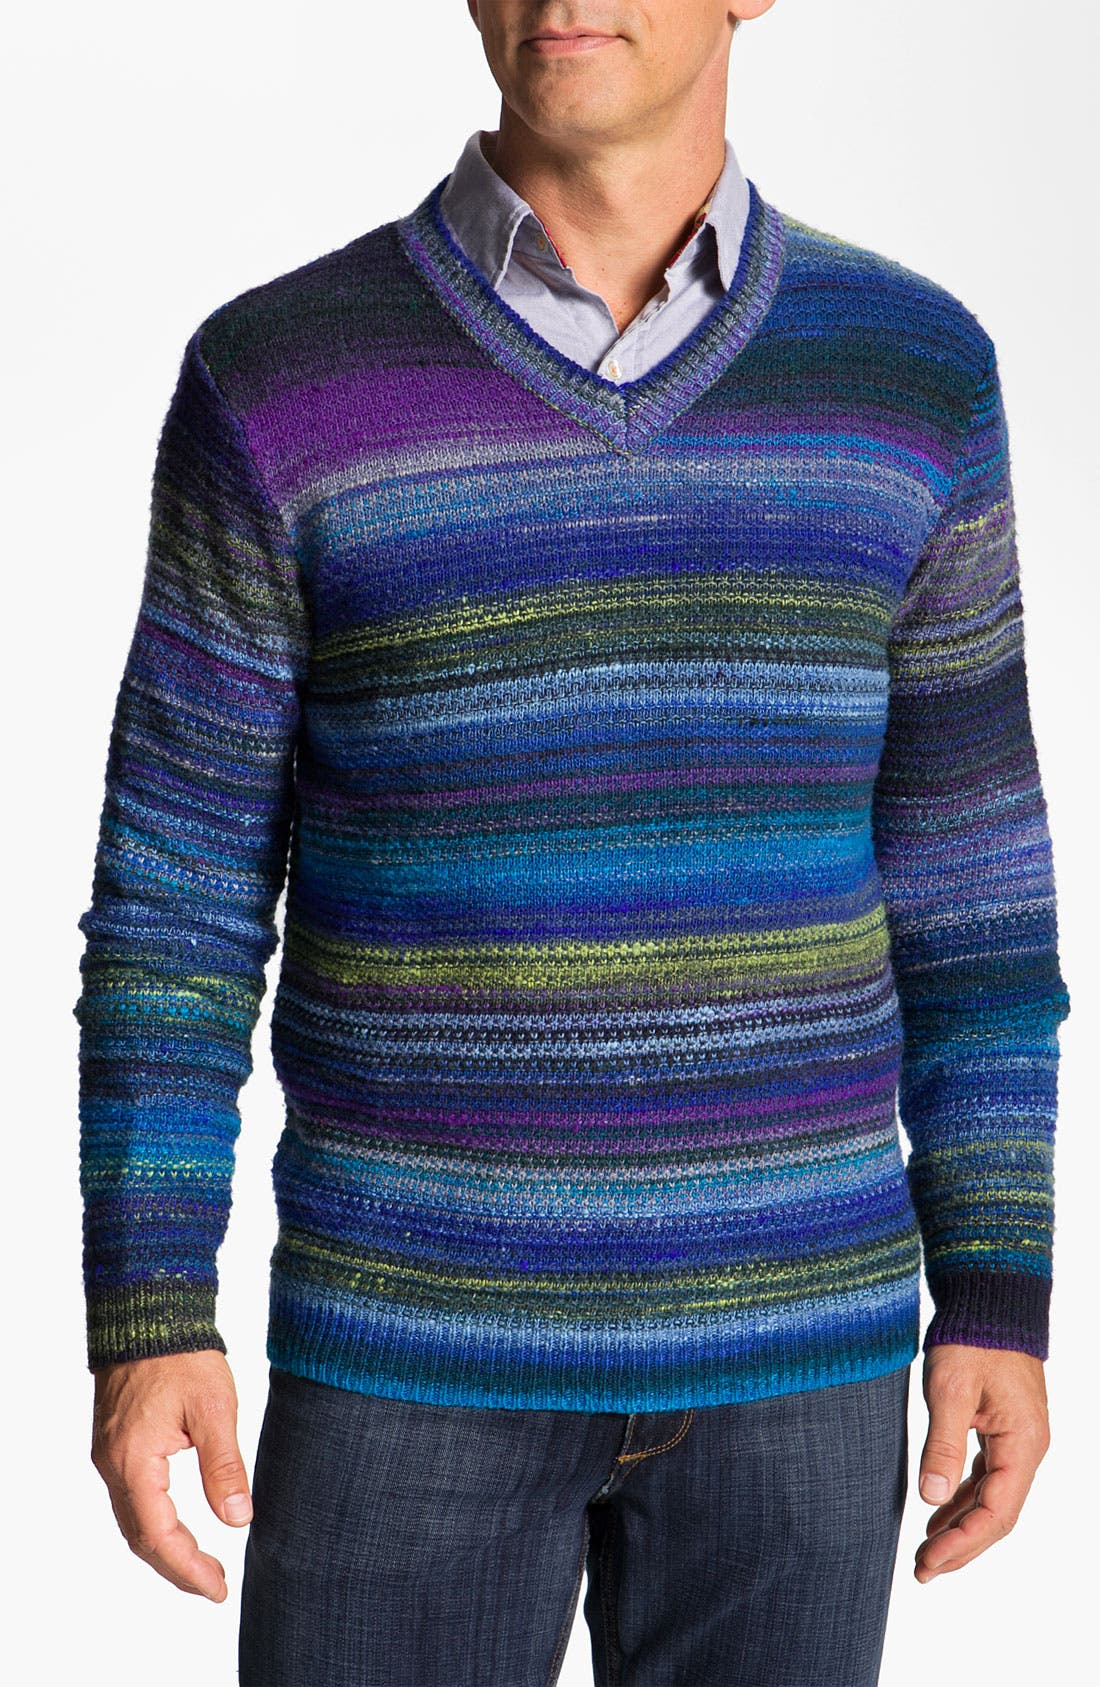 Main Image - Robert Graham 'Huntingdon' V-Neck Wool Blend Sweater